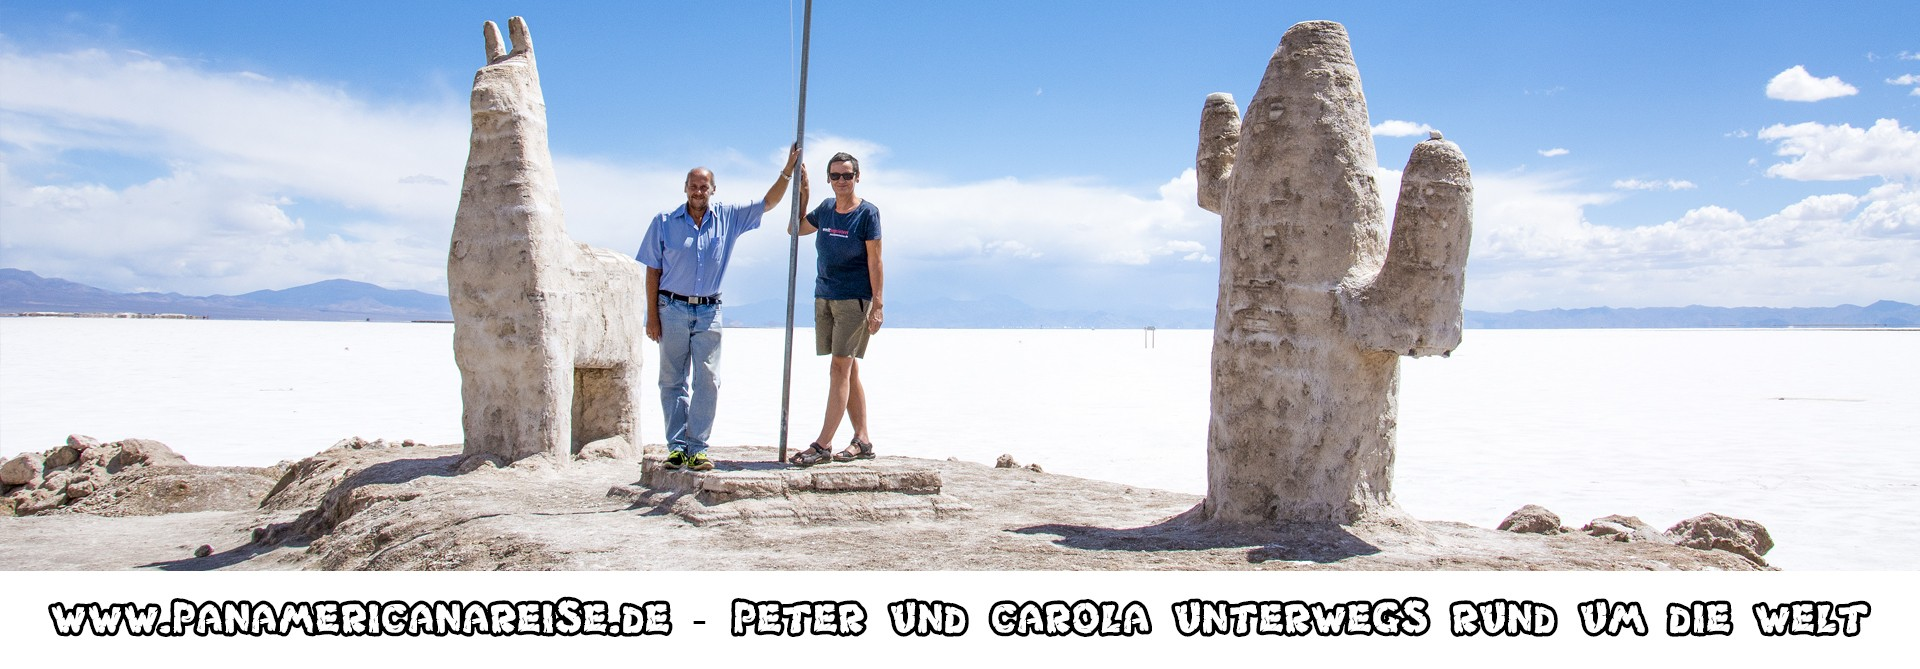 www.Panamericanareise.de